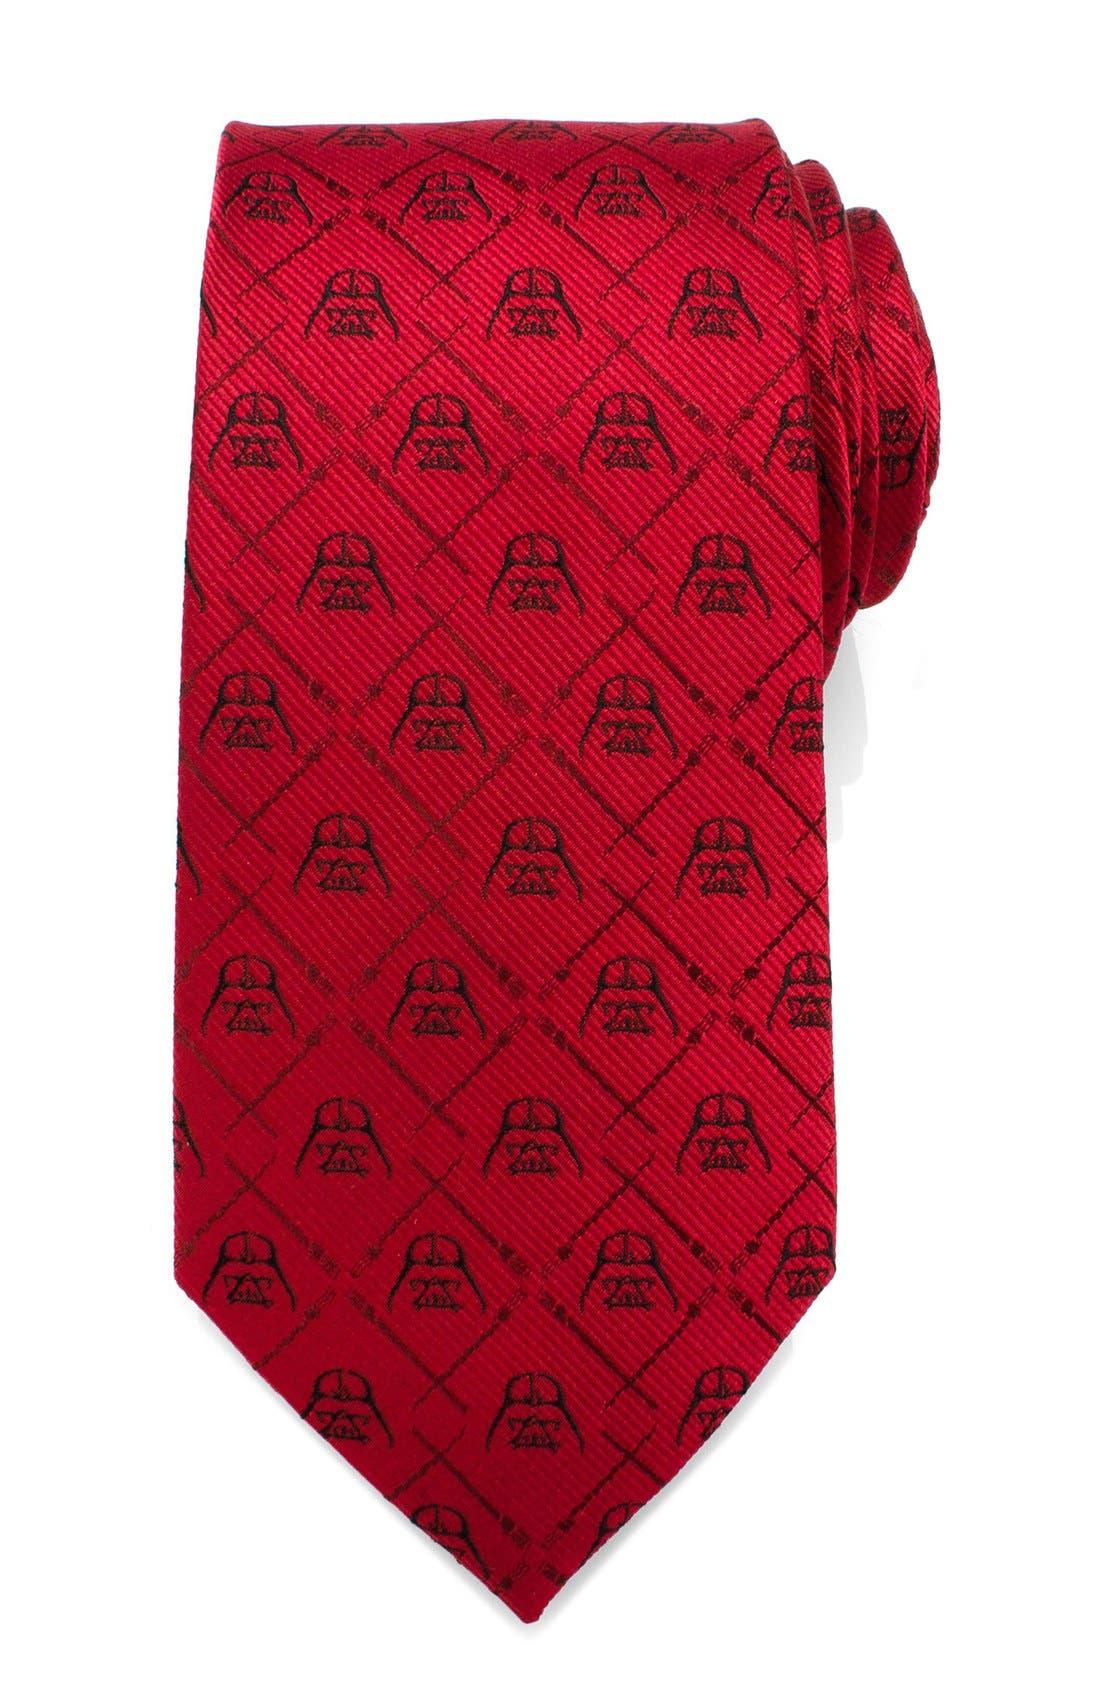 Main Image - Cufflinks, Inc. 'Darth Vader' Silk Tie